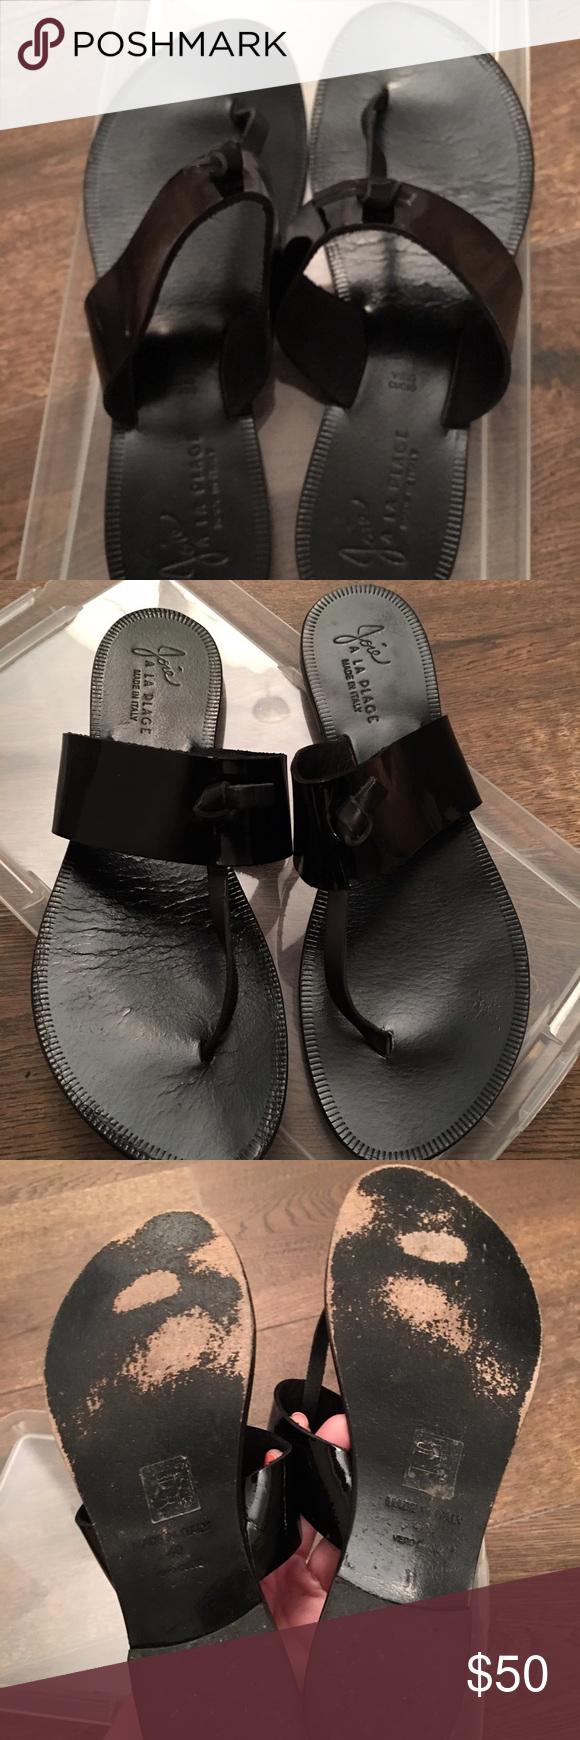 Black nice sandals - Joie Nice Sandals